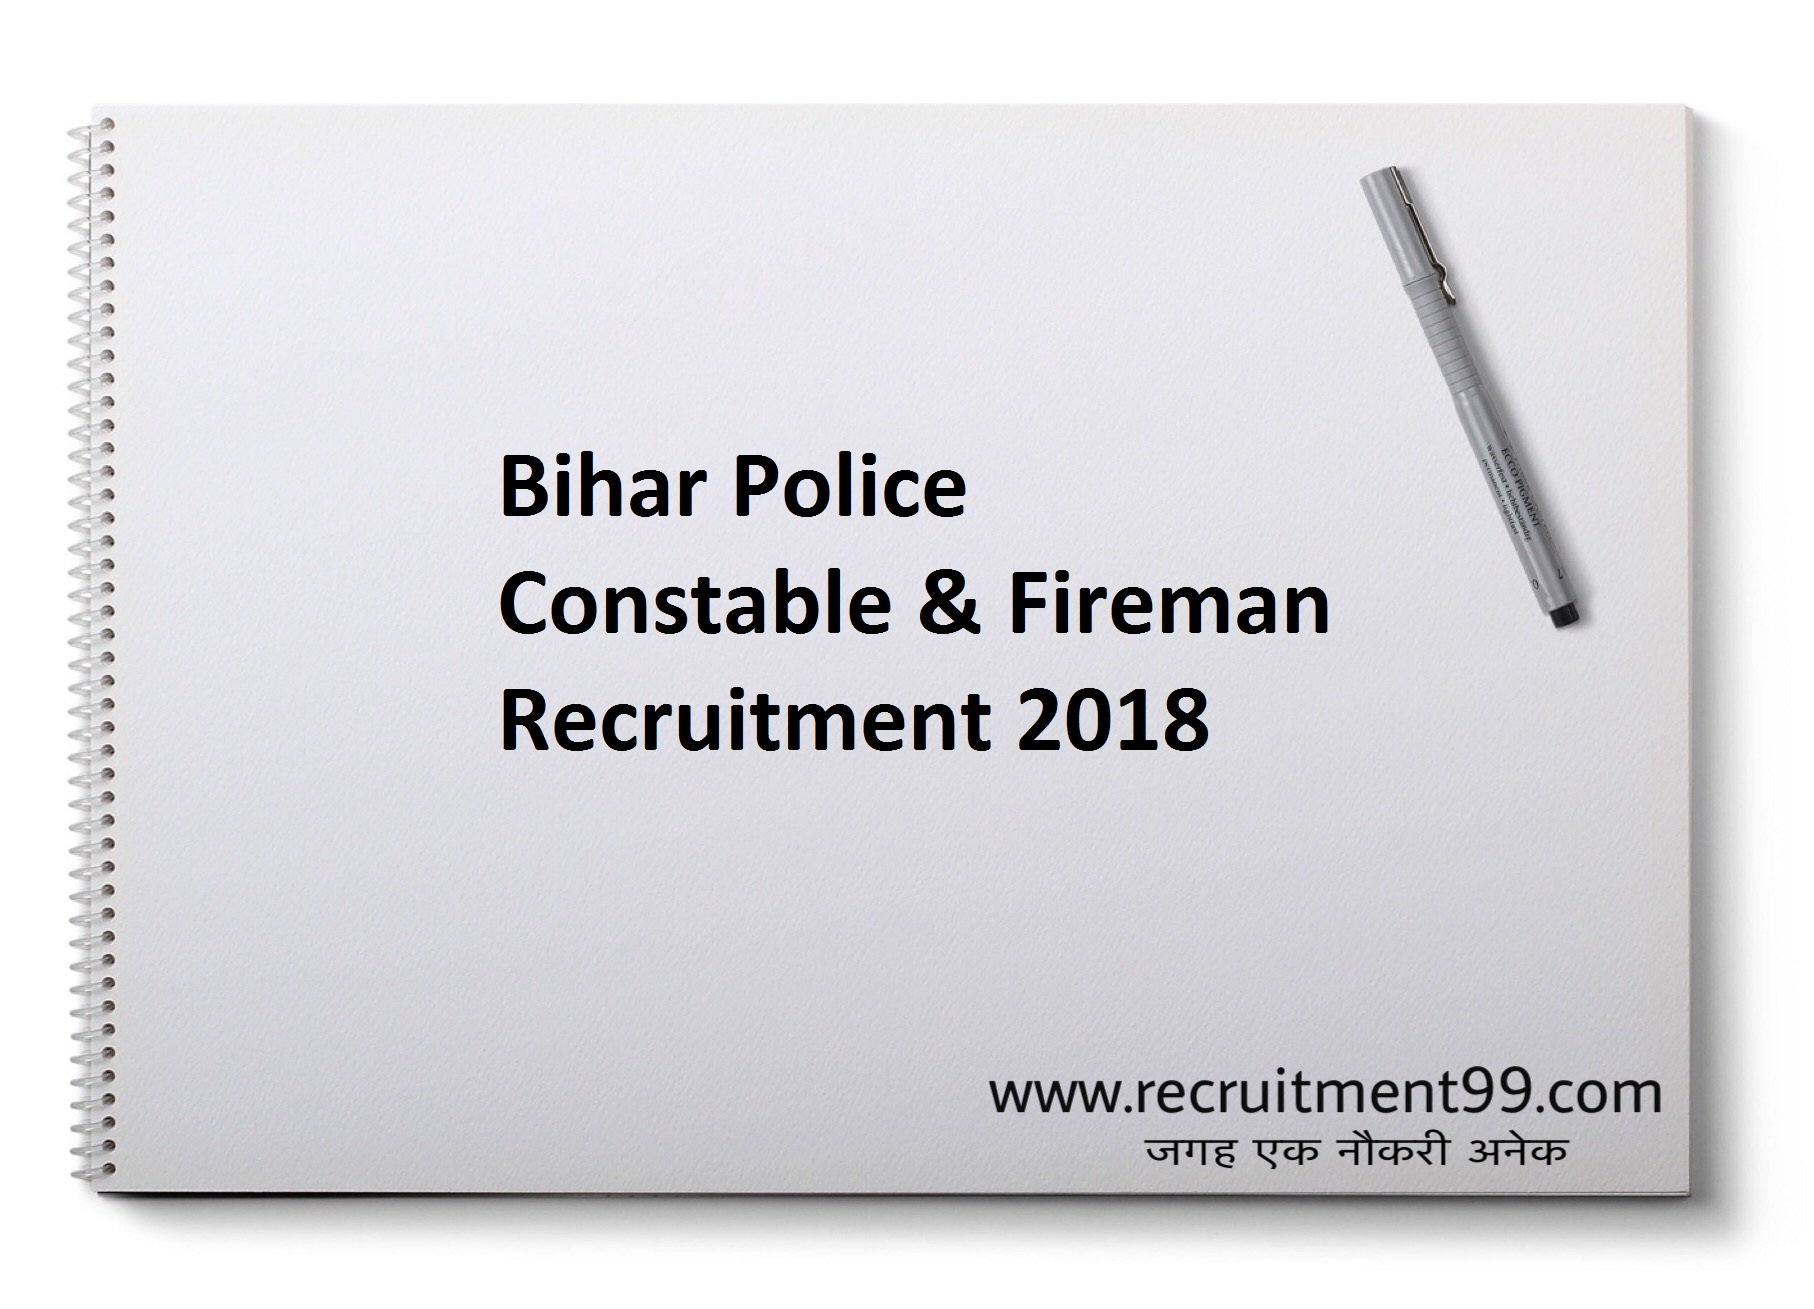 Bihar Police Constable Fireman Recruitment Admit Card Result 2018